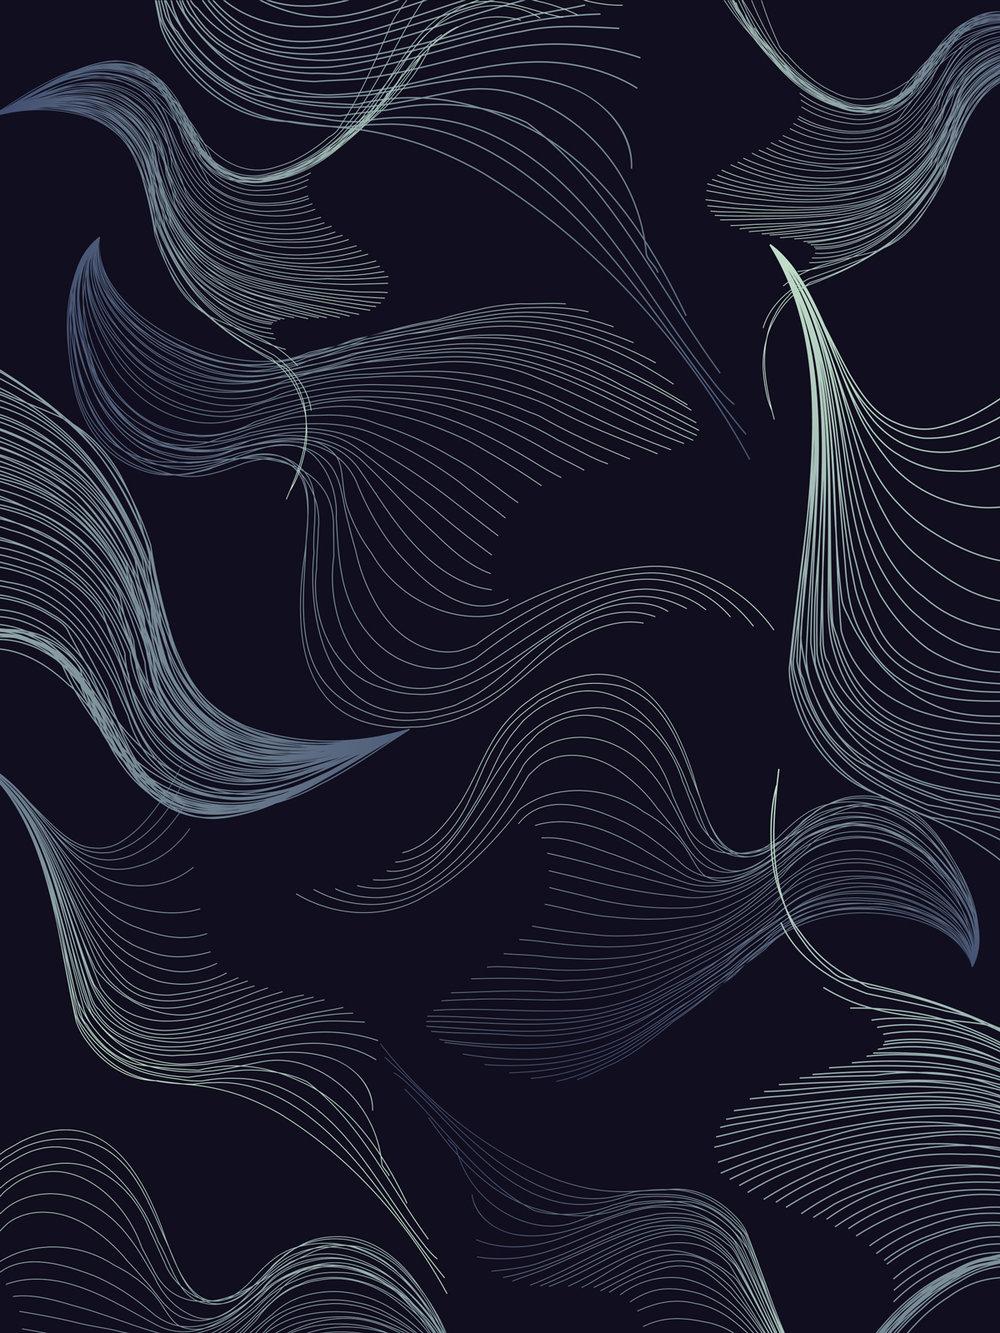 CO_11.jpg